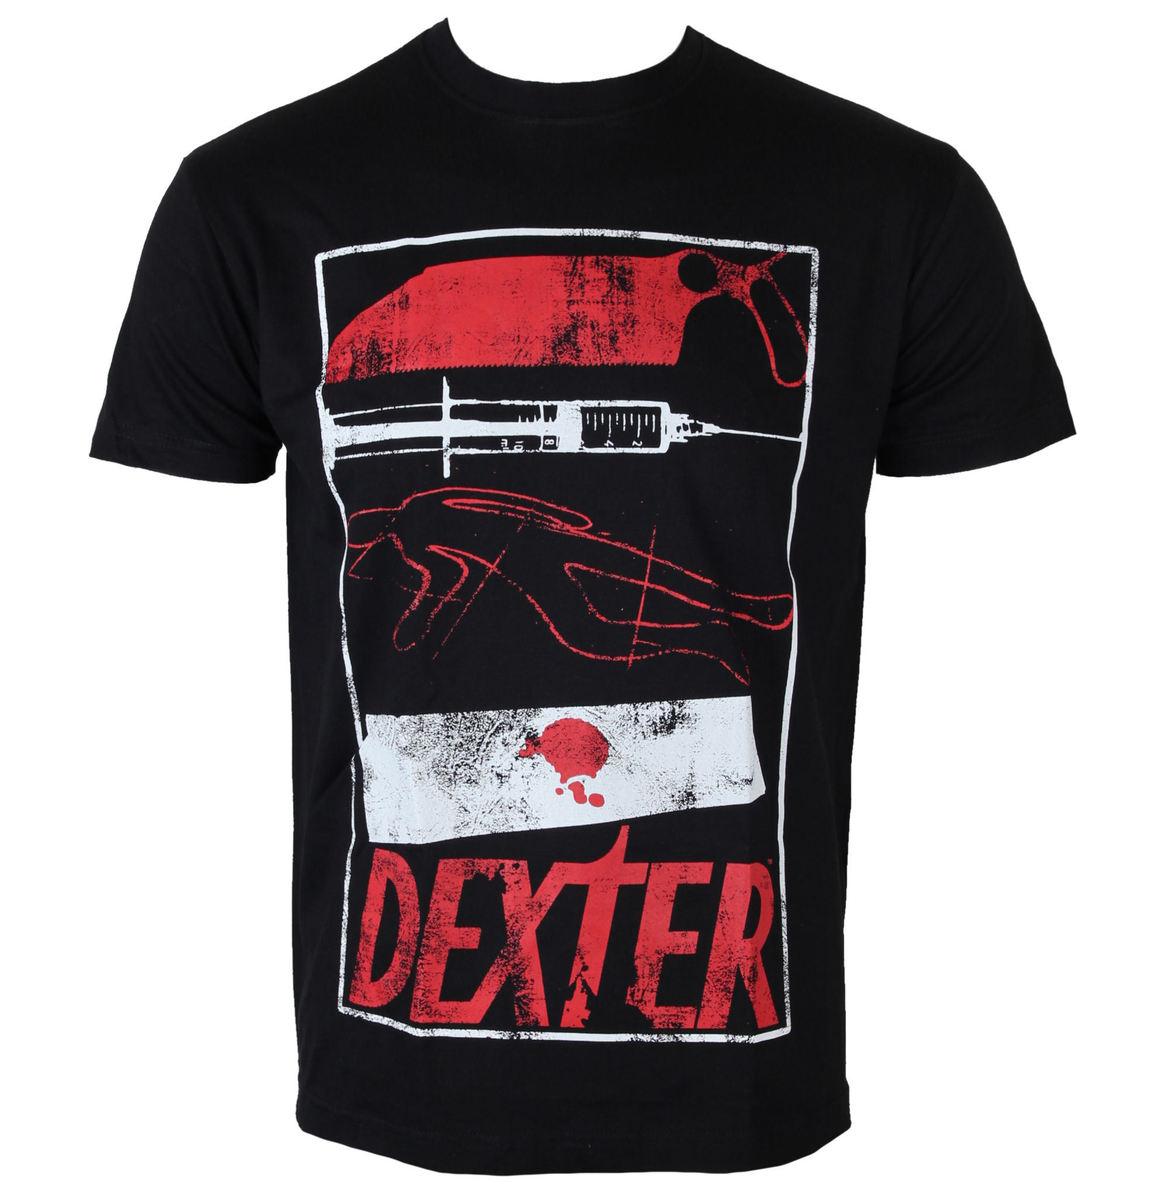 tričko pánské Dexter - Signs - Black - HYBRIS - CBS-1-DXT006-H50-16